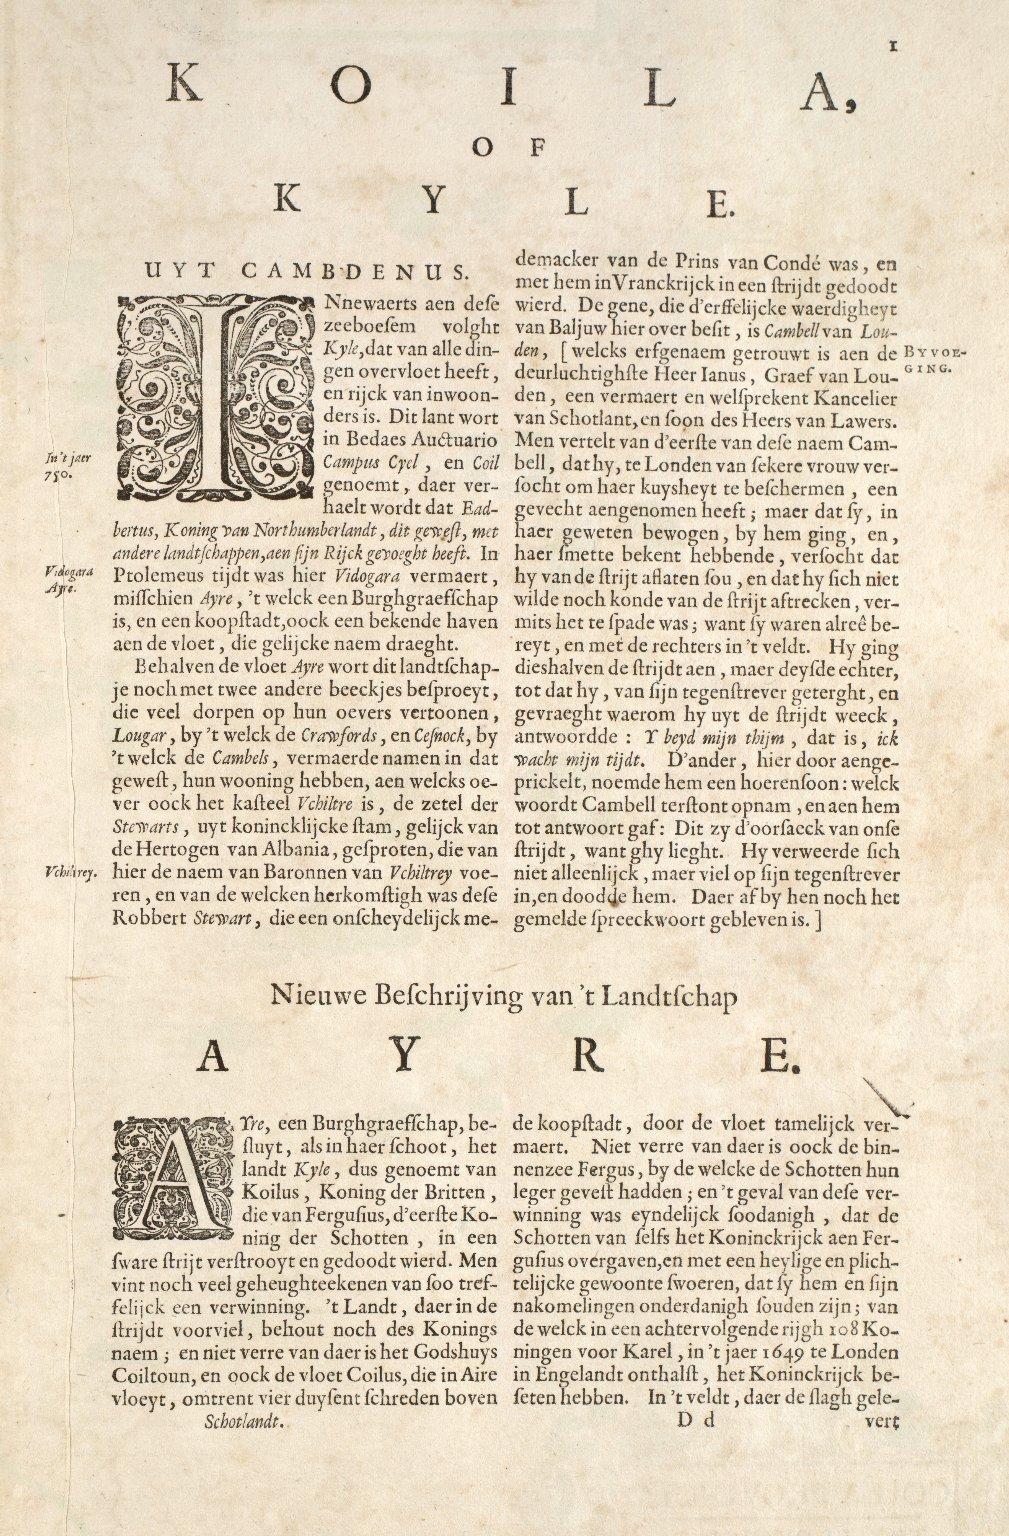 [Geographiae Blavianae] [Also known as: Atlas major] [061 of 153]